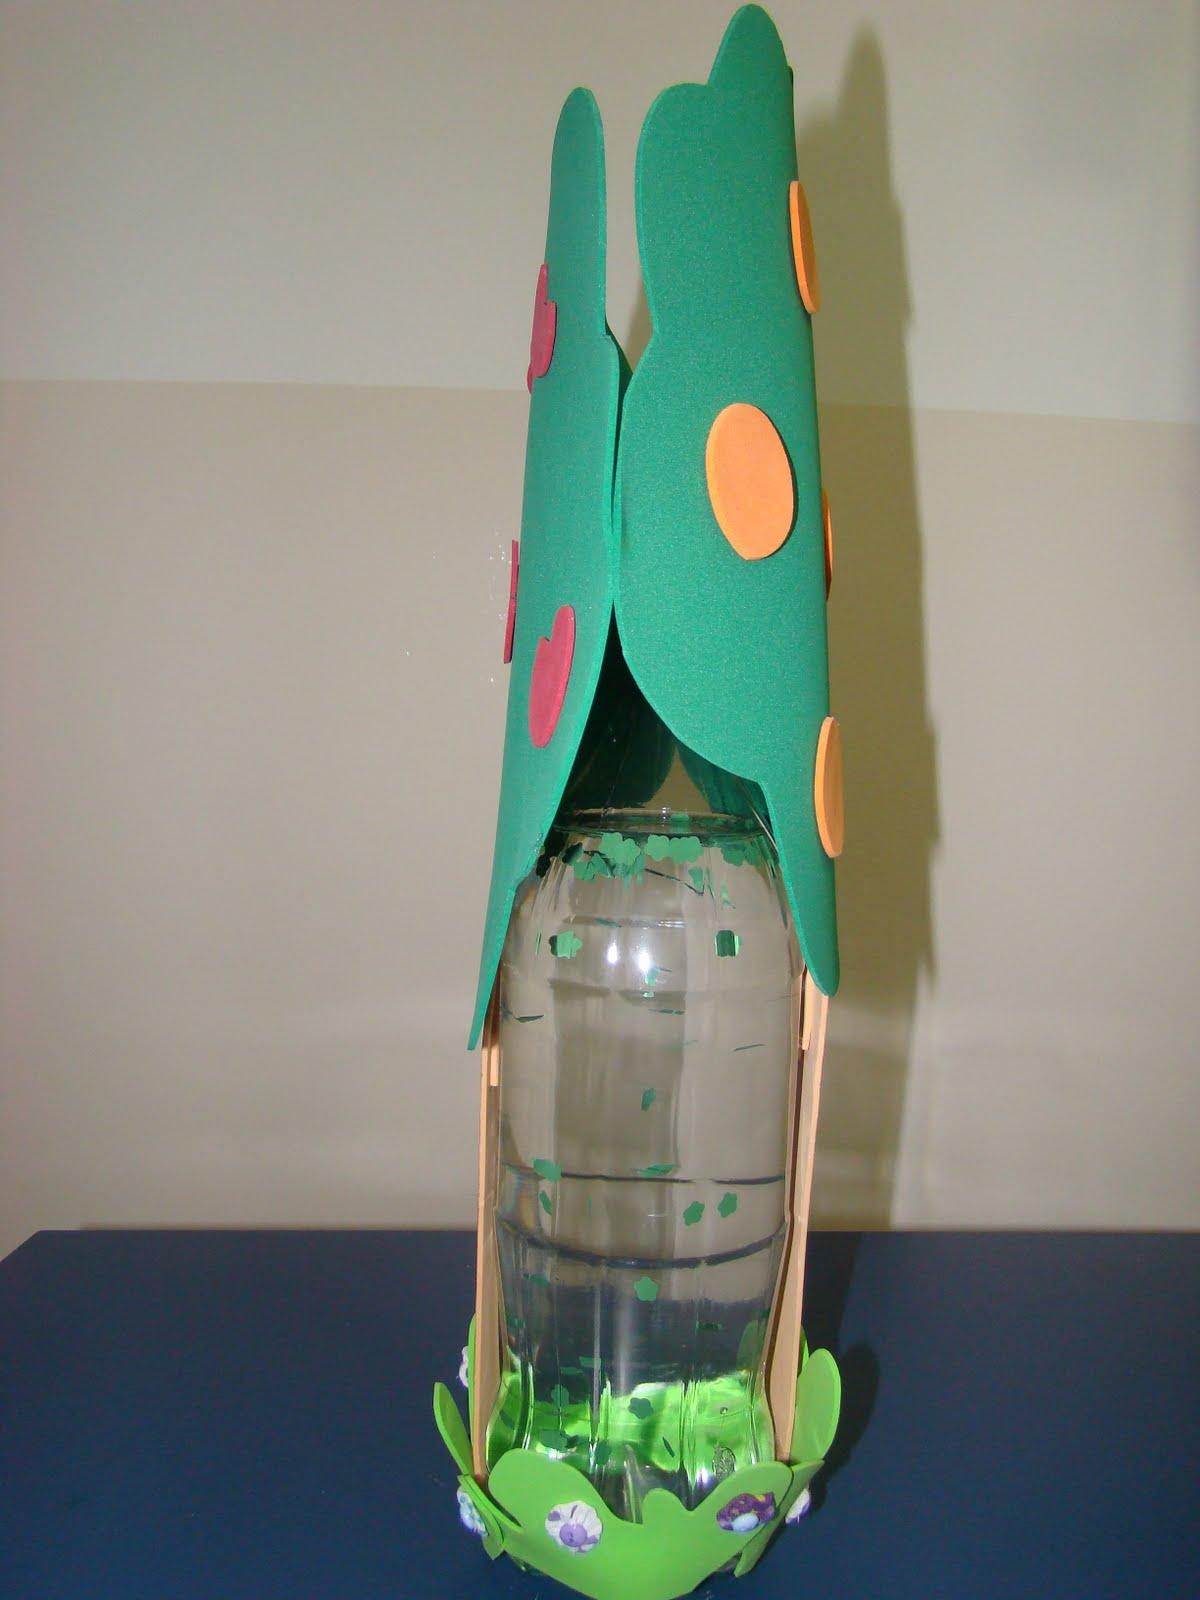 Una Botella Plastica La Tiene Que Esta Llena De Agua Fomi O